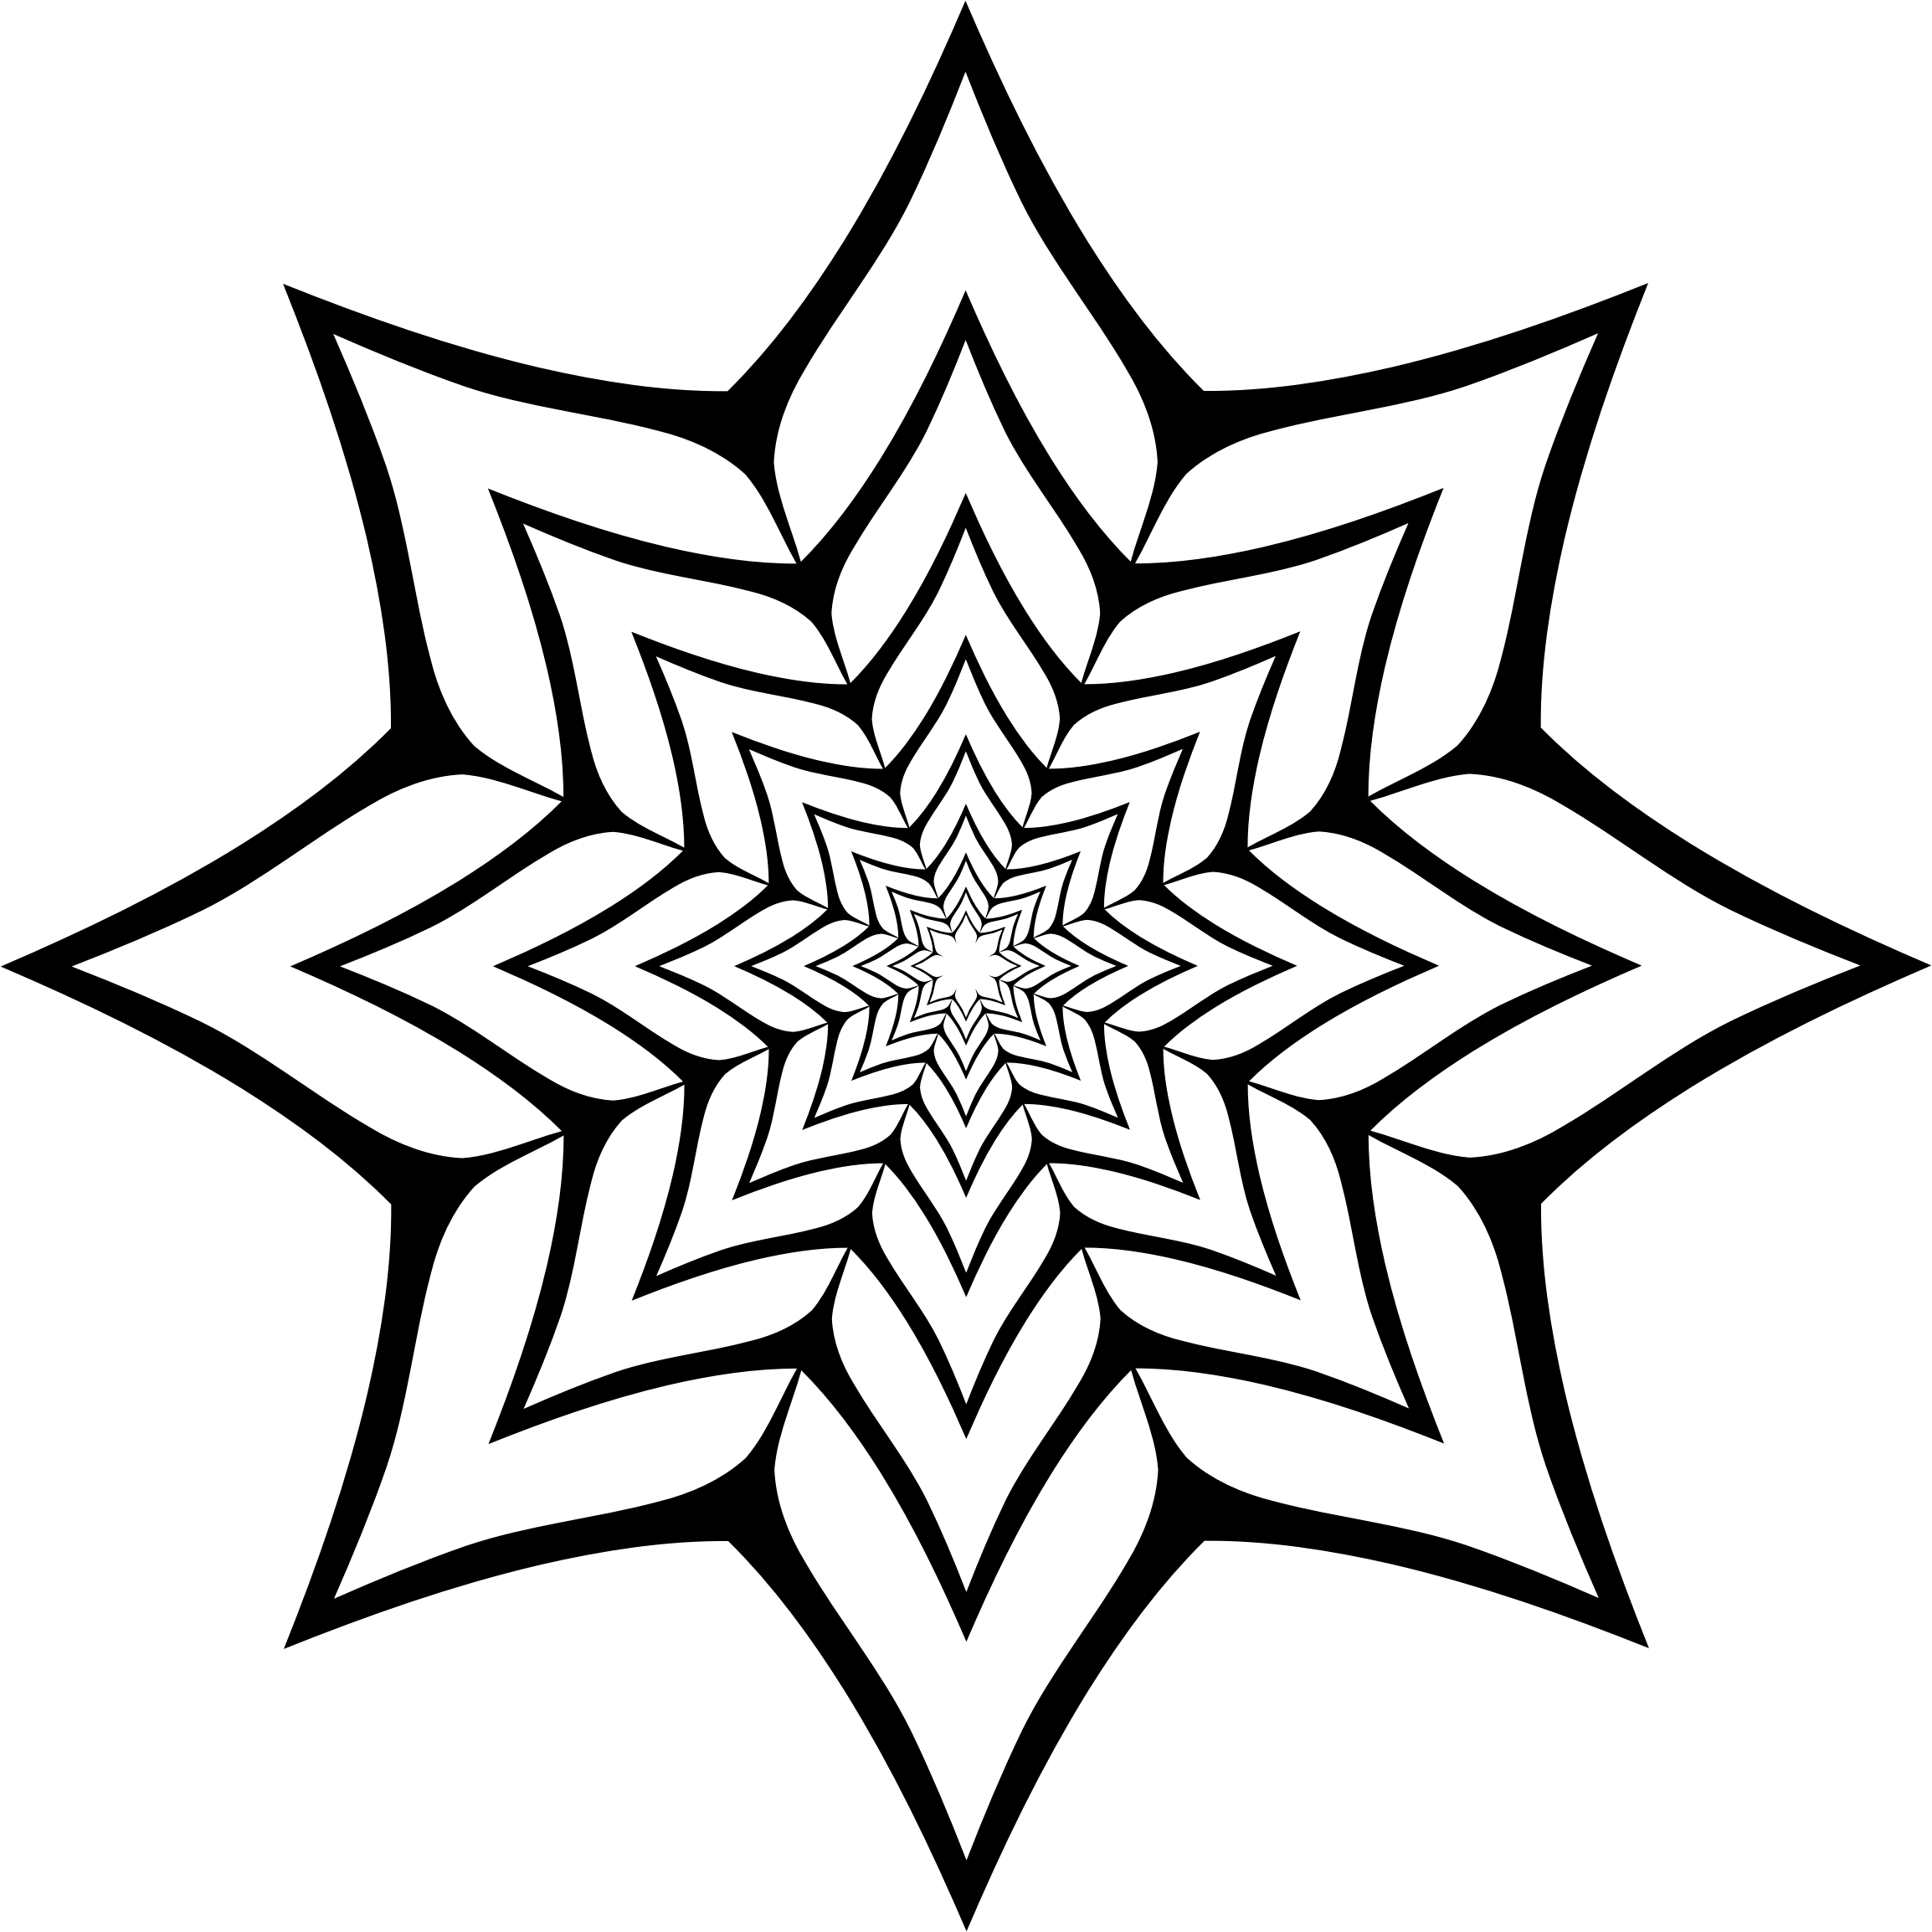 2308x2308 Clipart